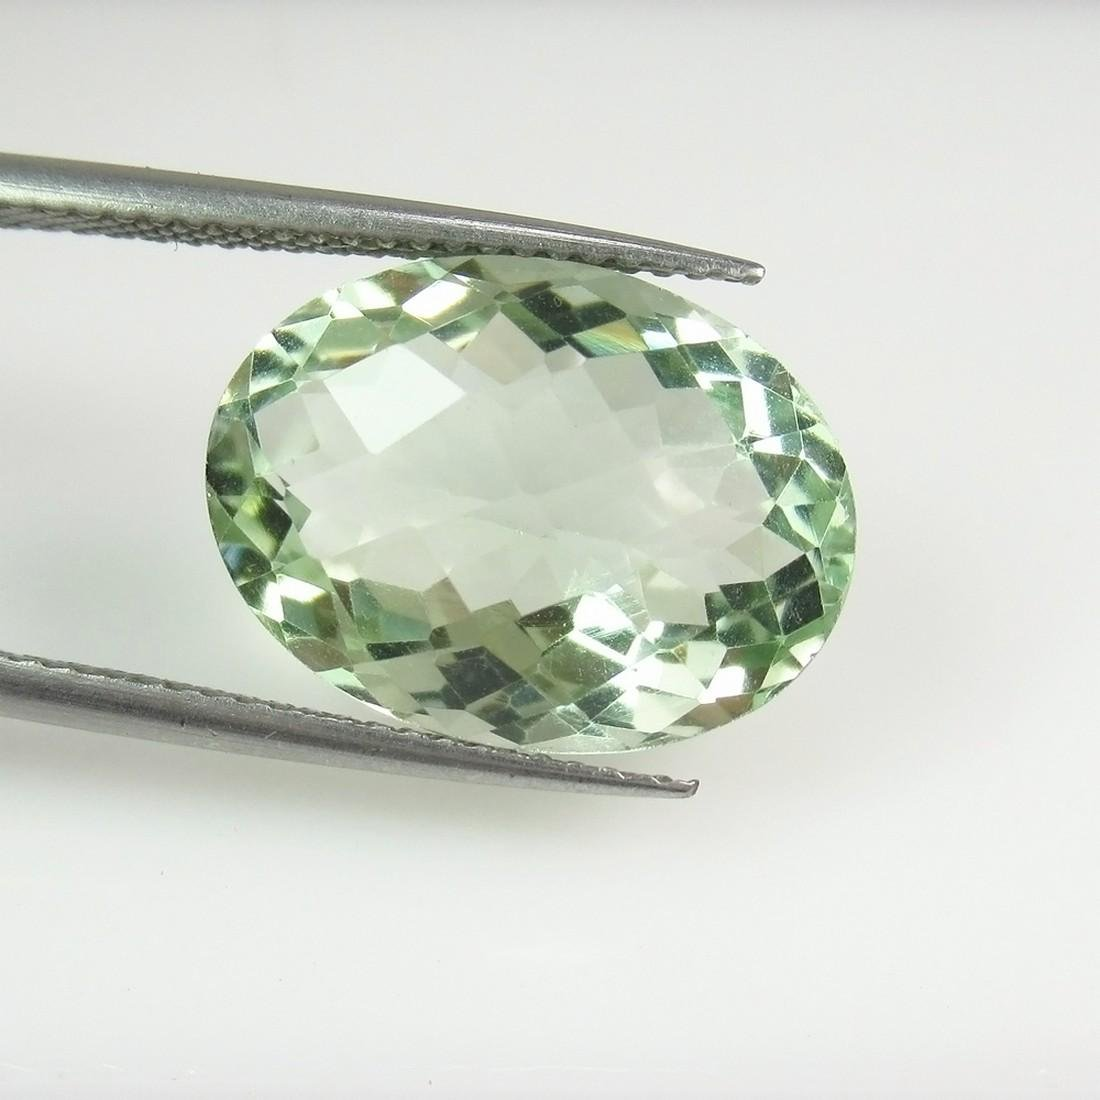 8.82 Ct Genuine Brazil Green Amethyst 16X12 mm Oval Cut